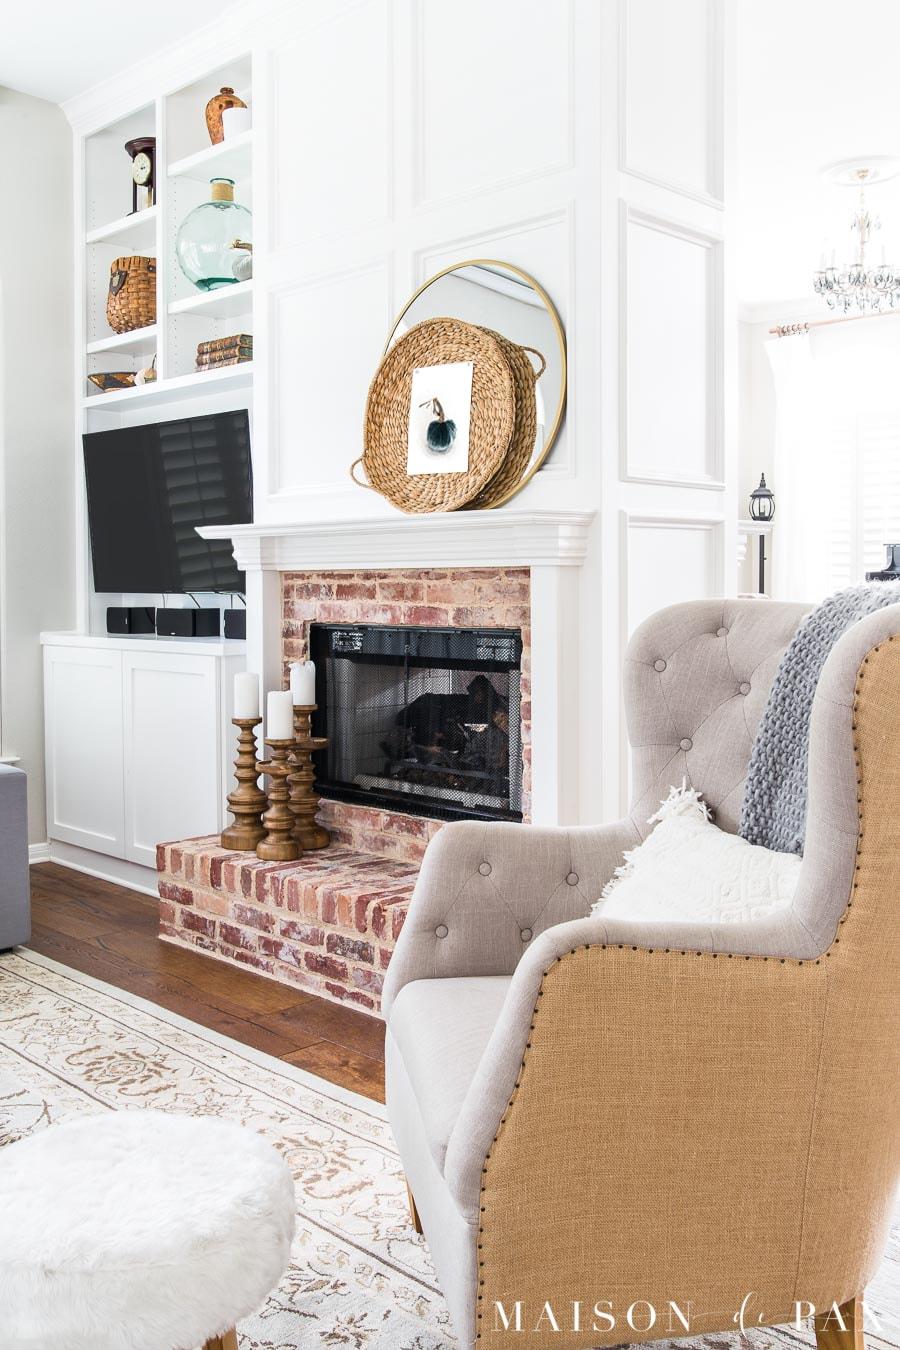 Gray Living Room with Simple Fall Decor - Maison de Pax on Room Decor Ideas  id=58023